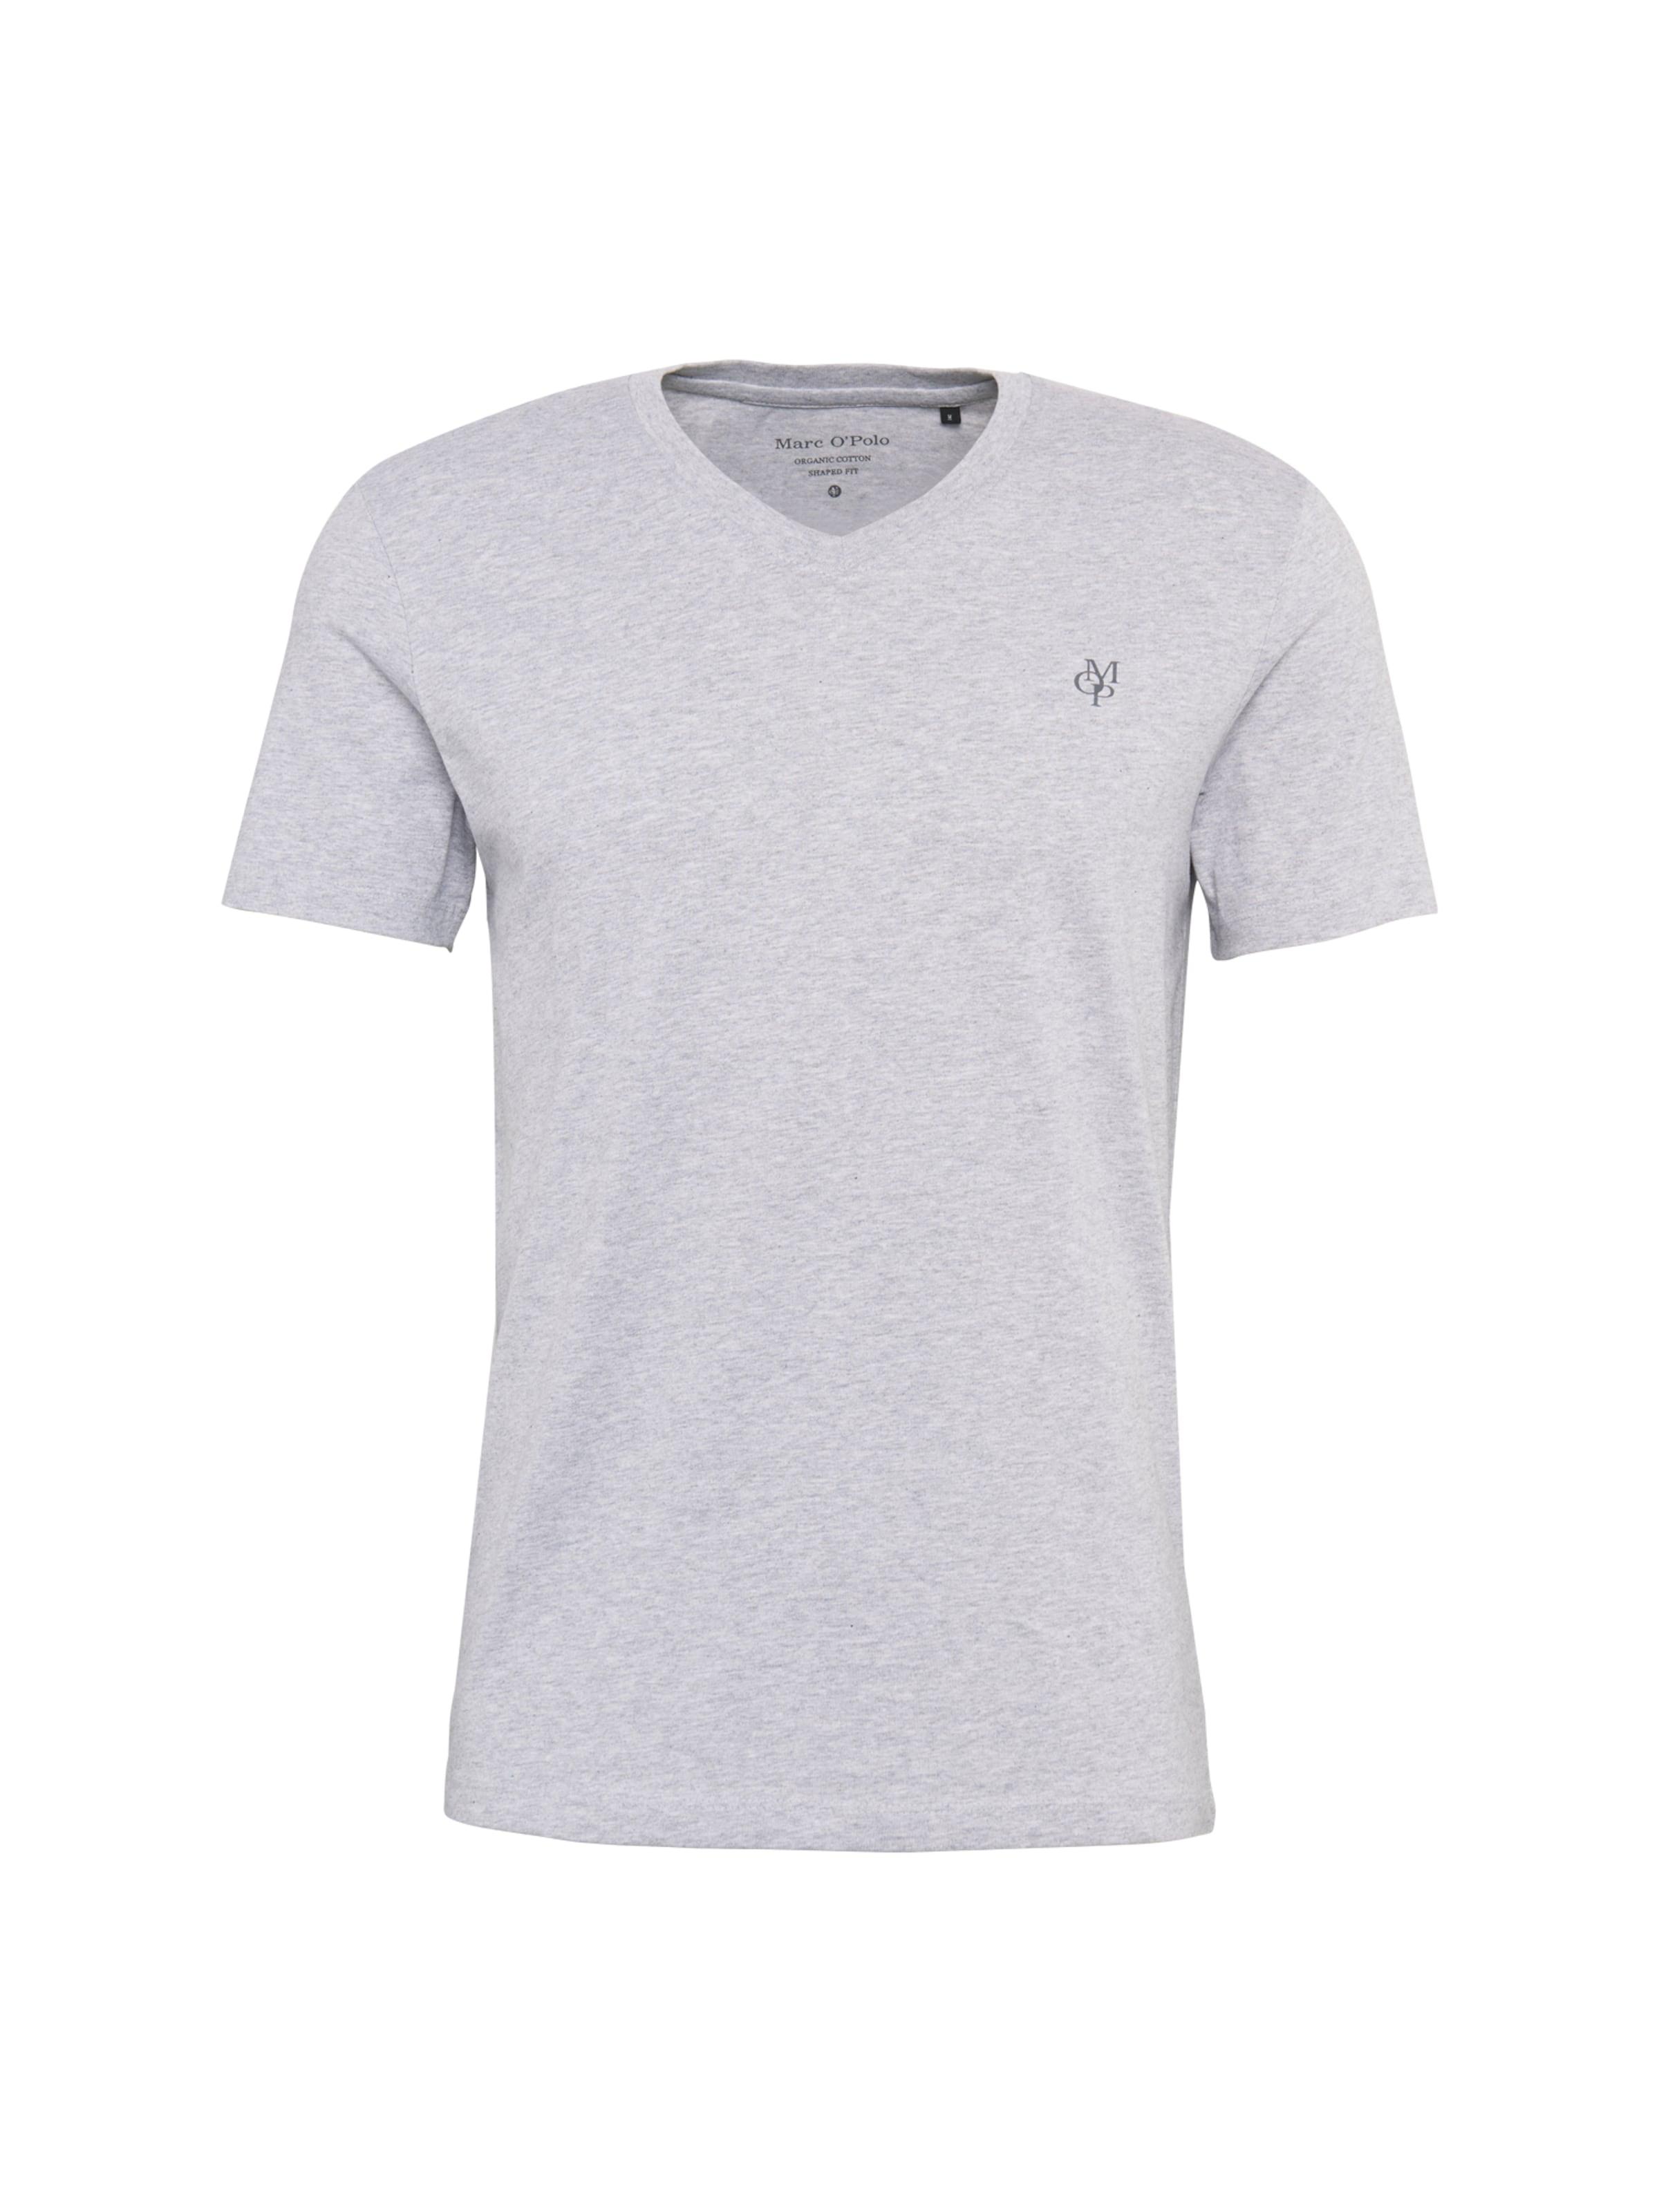 En O'polo Gris Marc Chiné T shirt oxBeWrdCQ